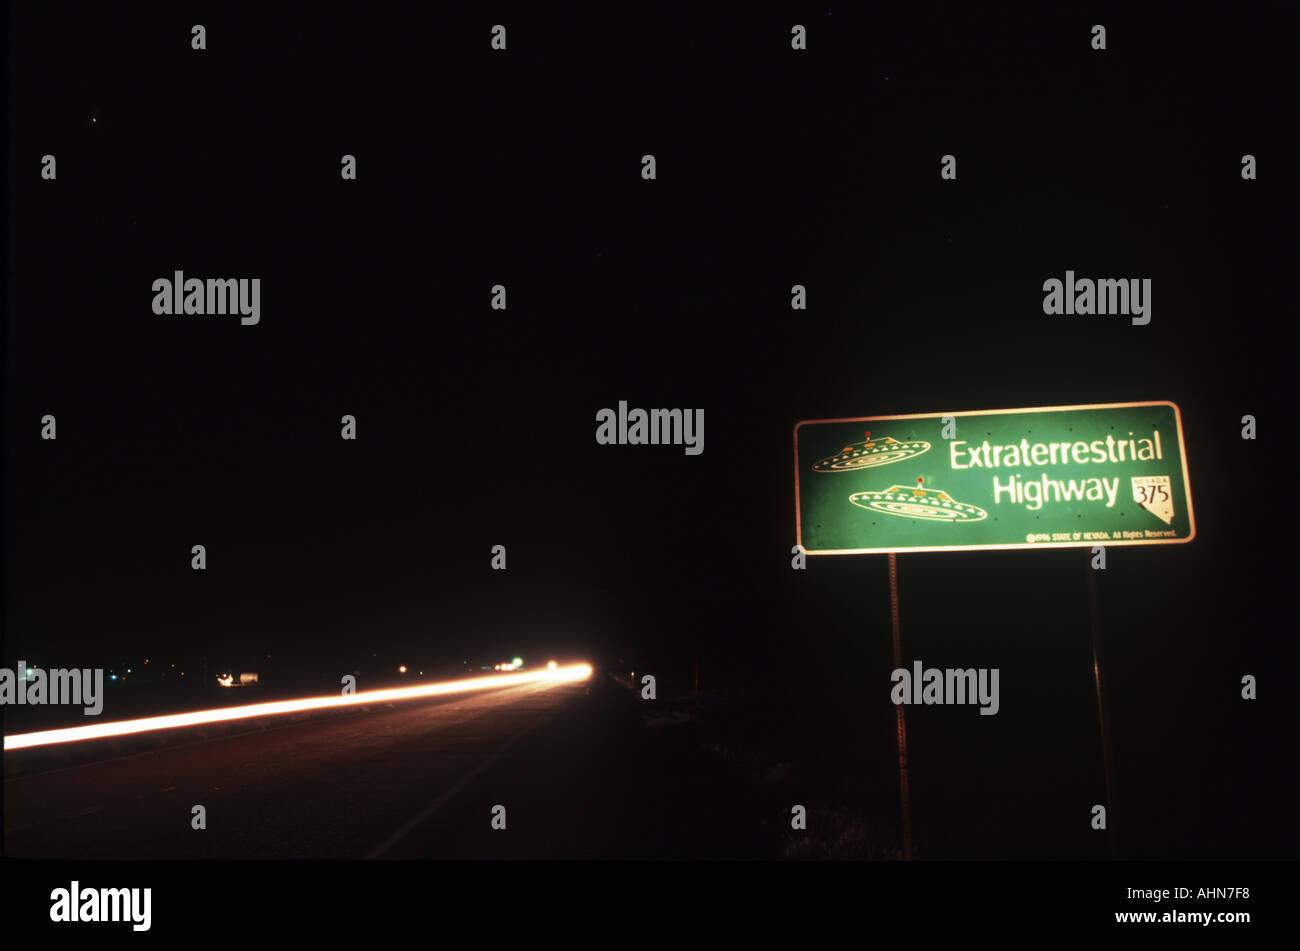 extraterrestrial-highway-nevada-AHN7F8.j